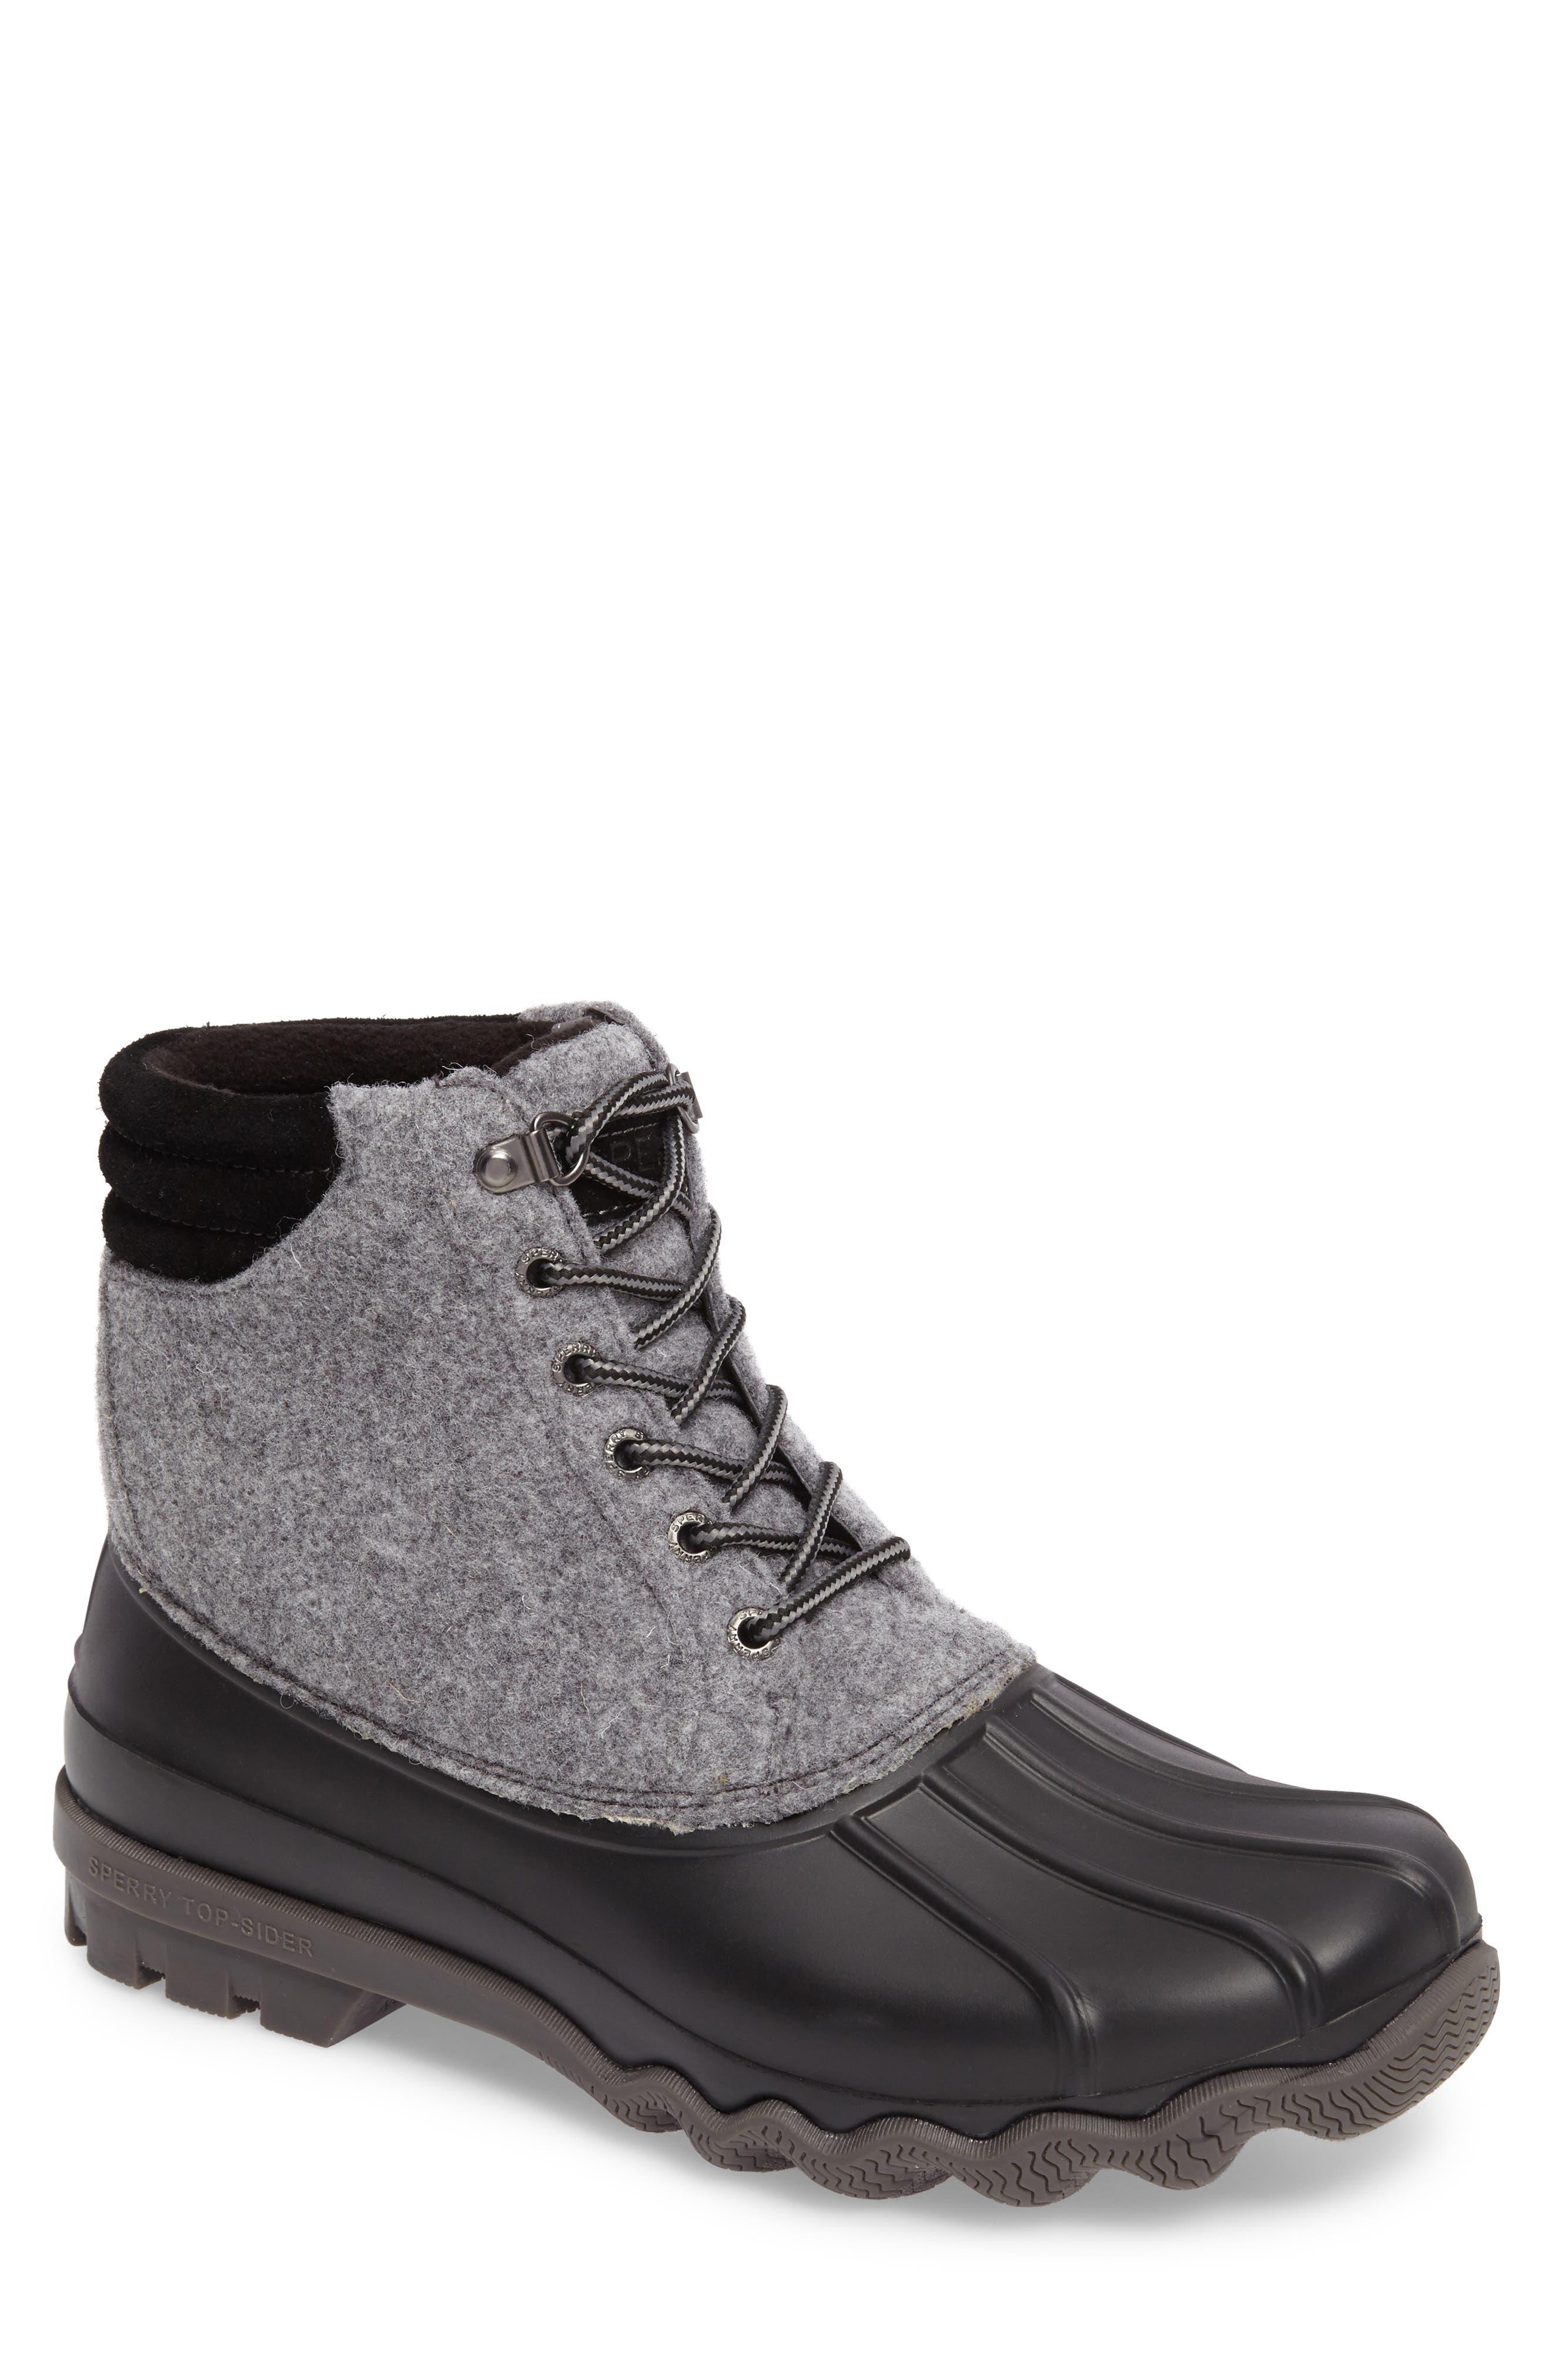 Avenue Rain Boot,                             Main thumbnail 1, color,                             Grey Leather